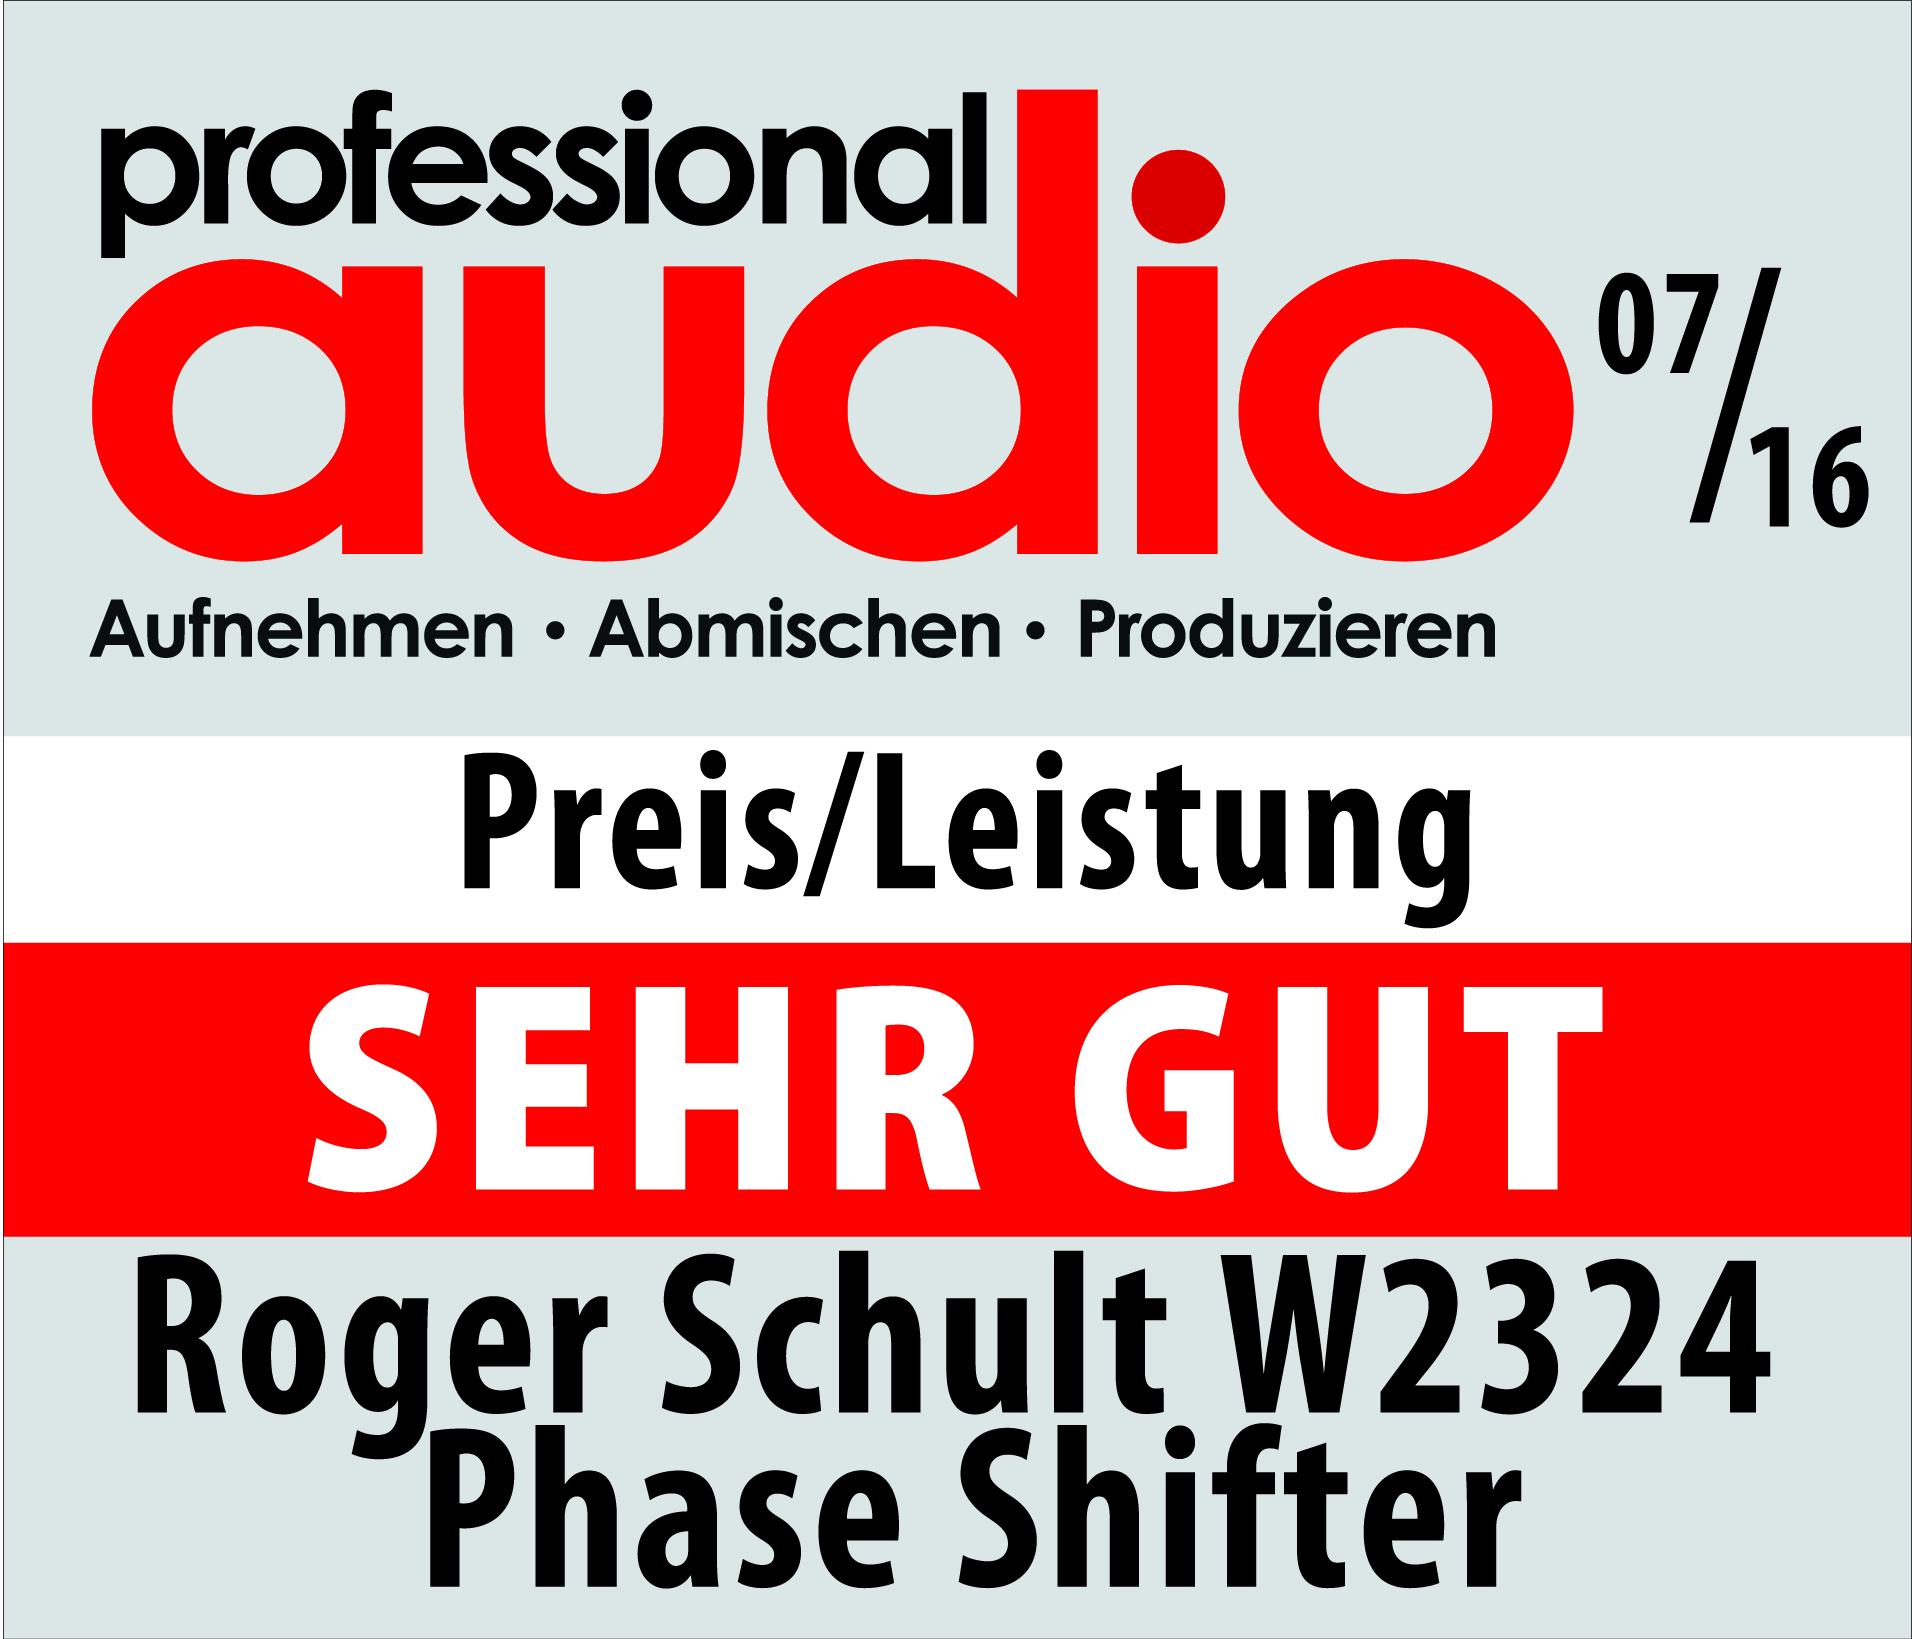 PAM-Testsiegel-Roger-Schult-W2324-Phase-Shifter